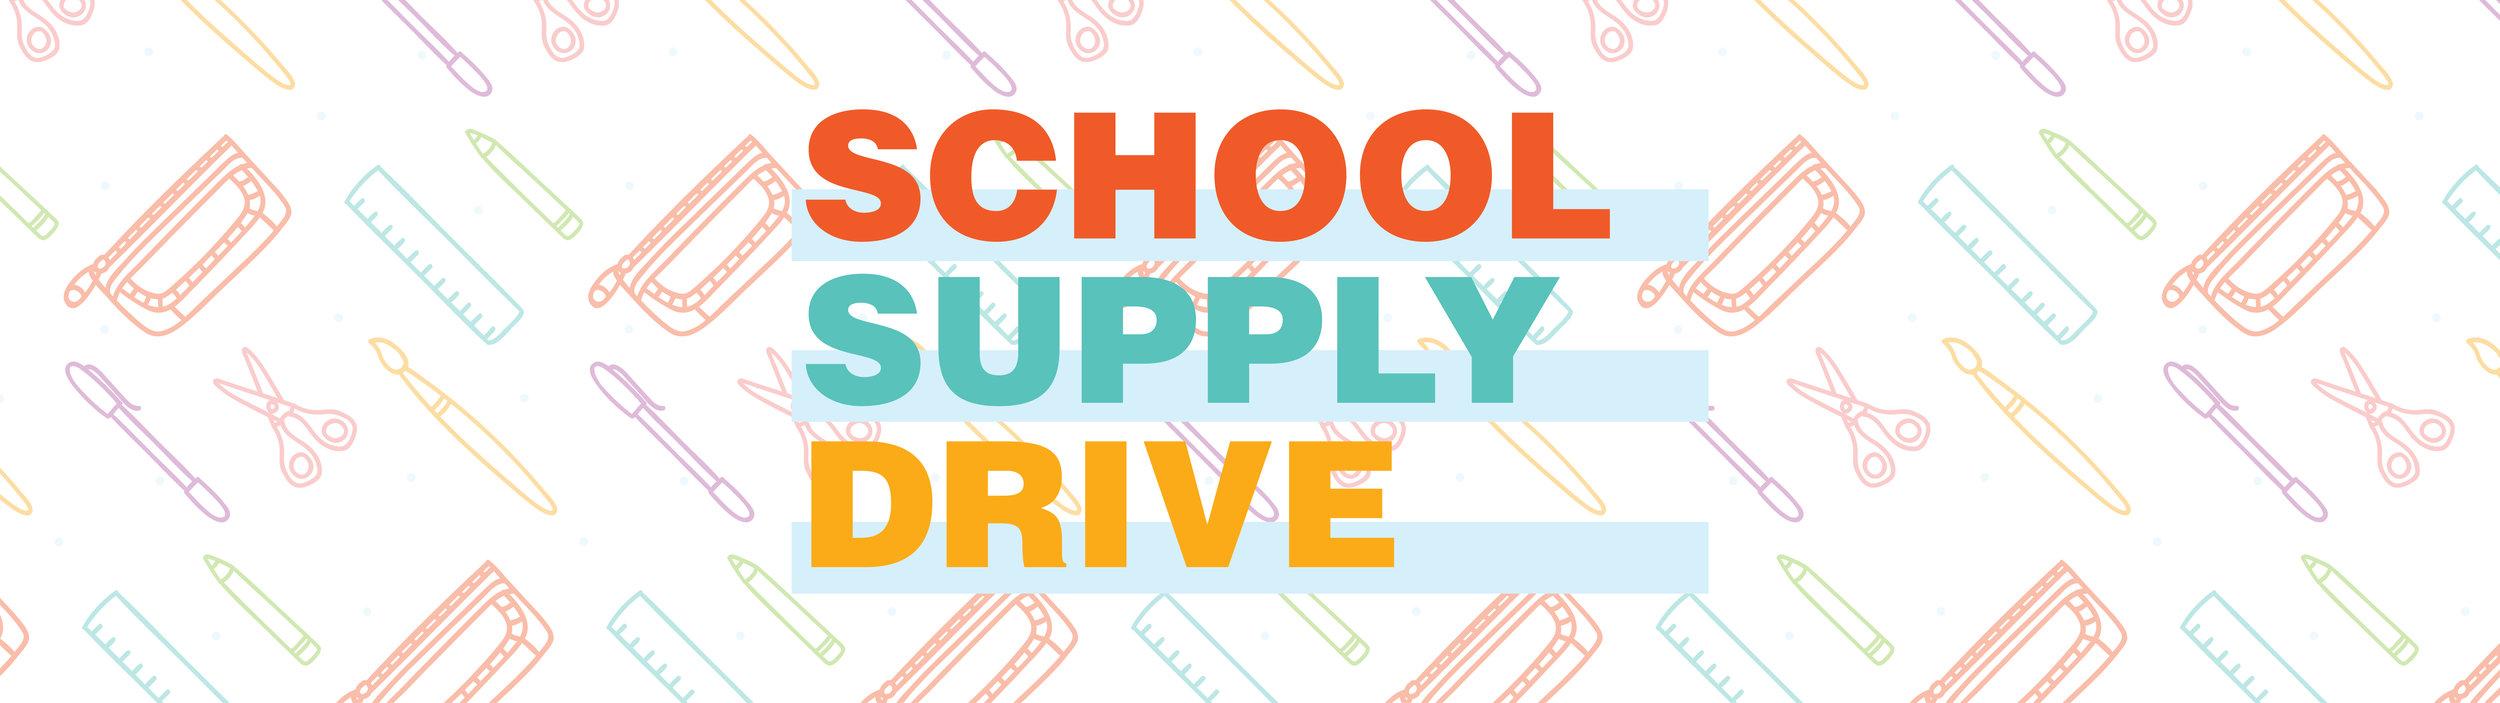 School Supply Drive-05.jpg